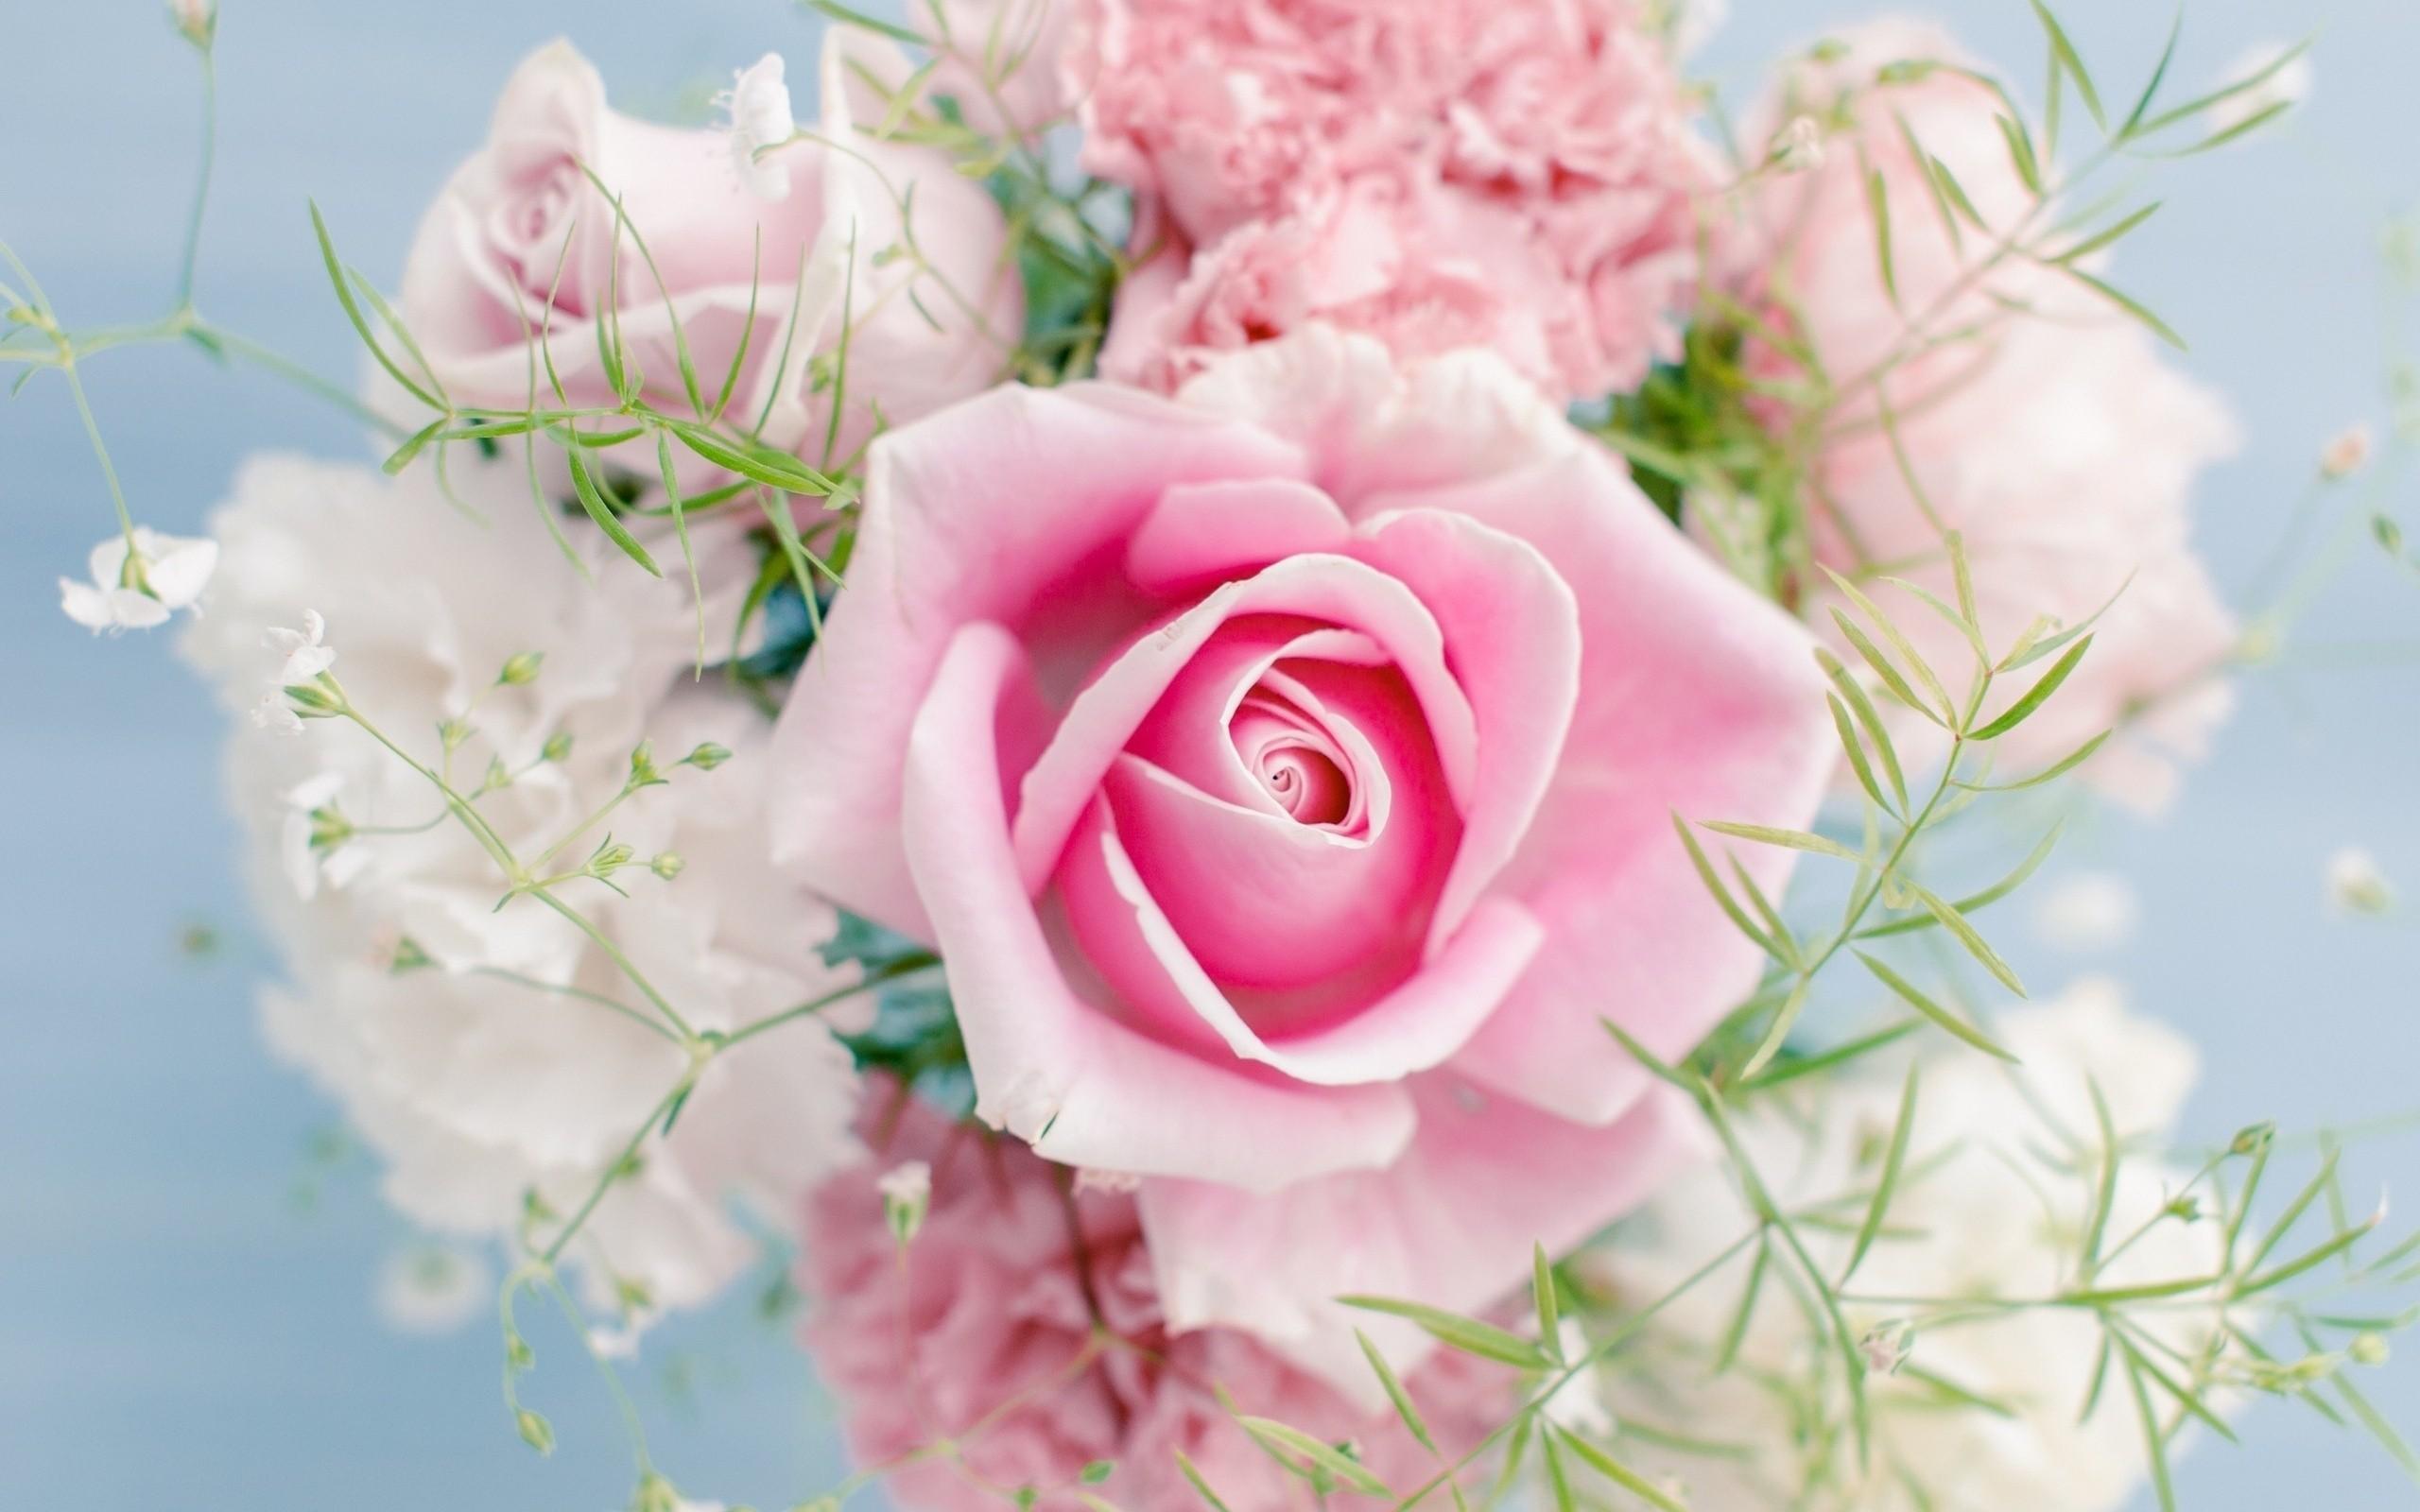 Fondos Flores ADNFriki (1)